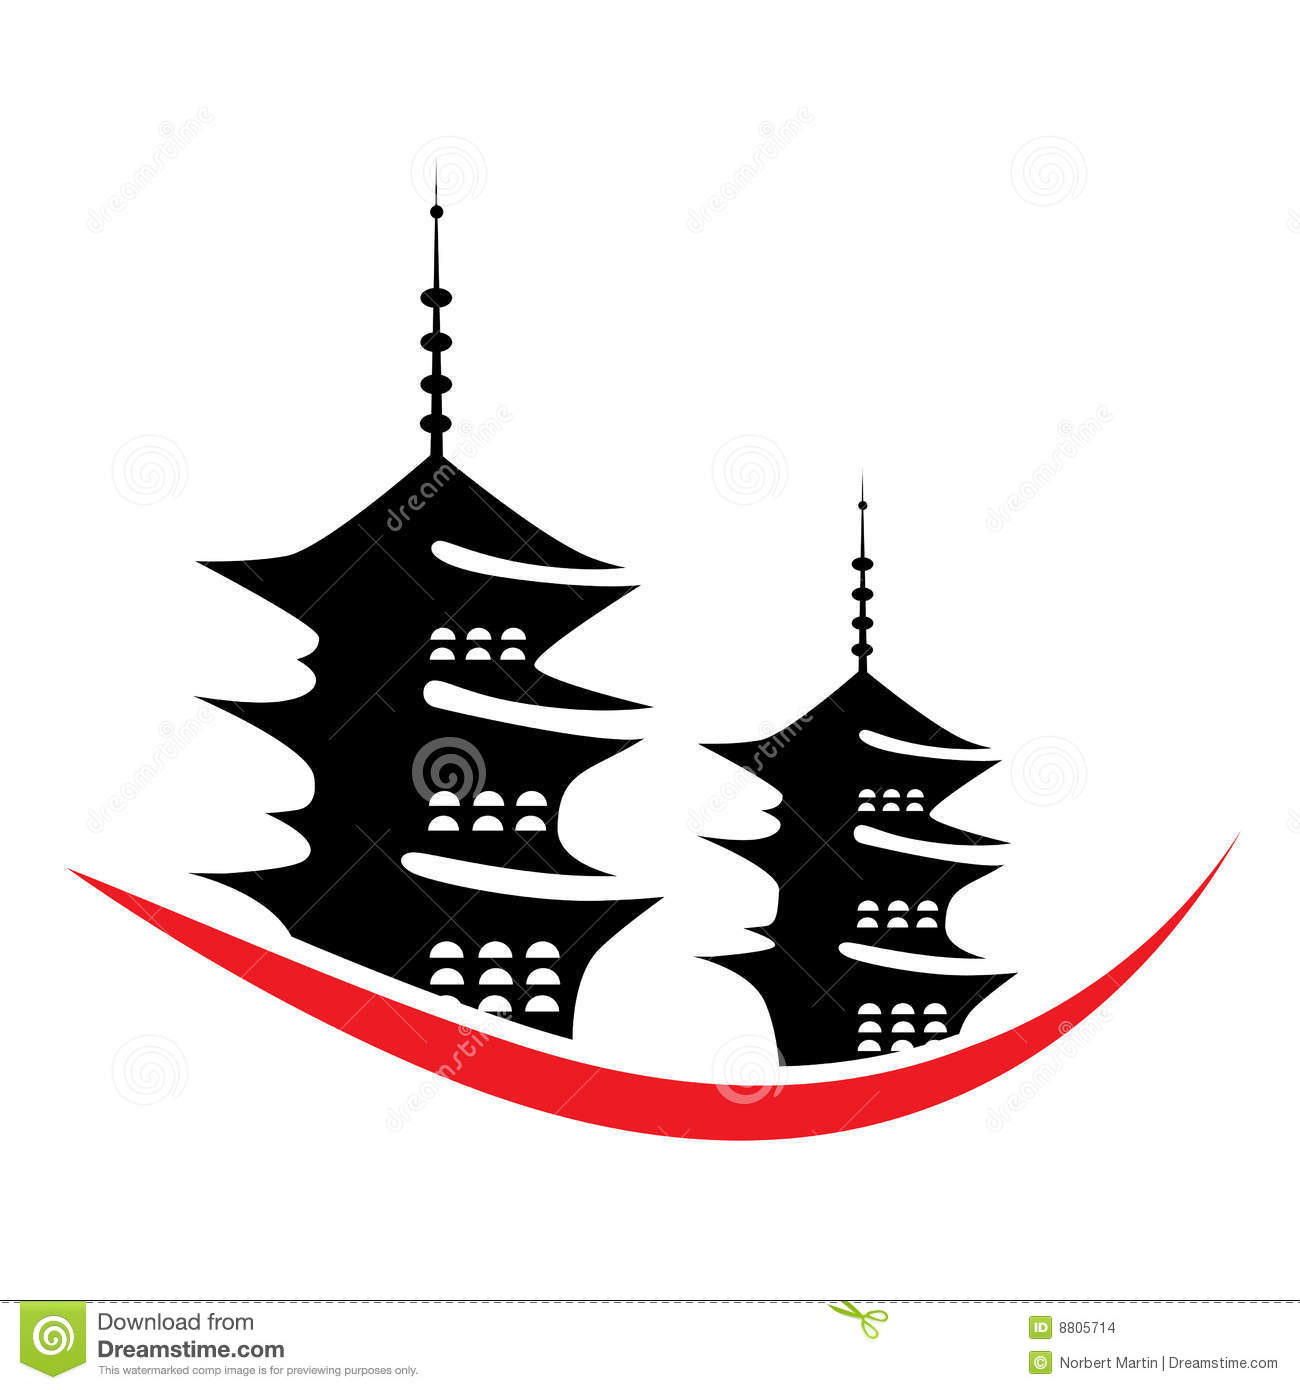 Pagoda clipart #8, Download drawings